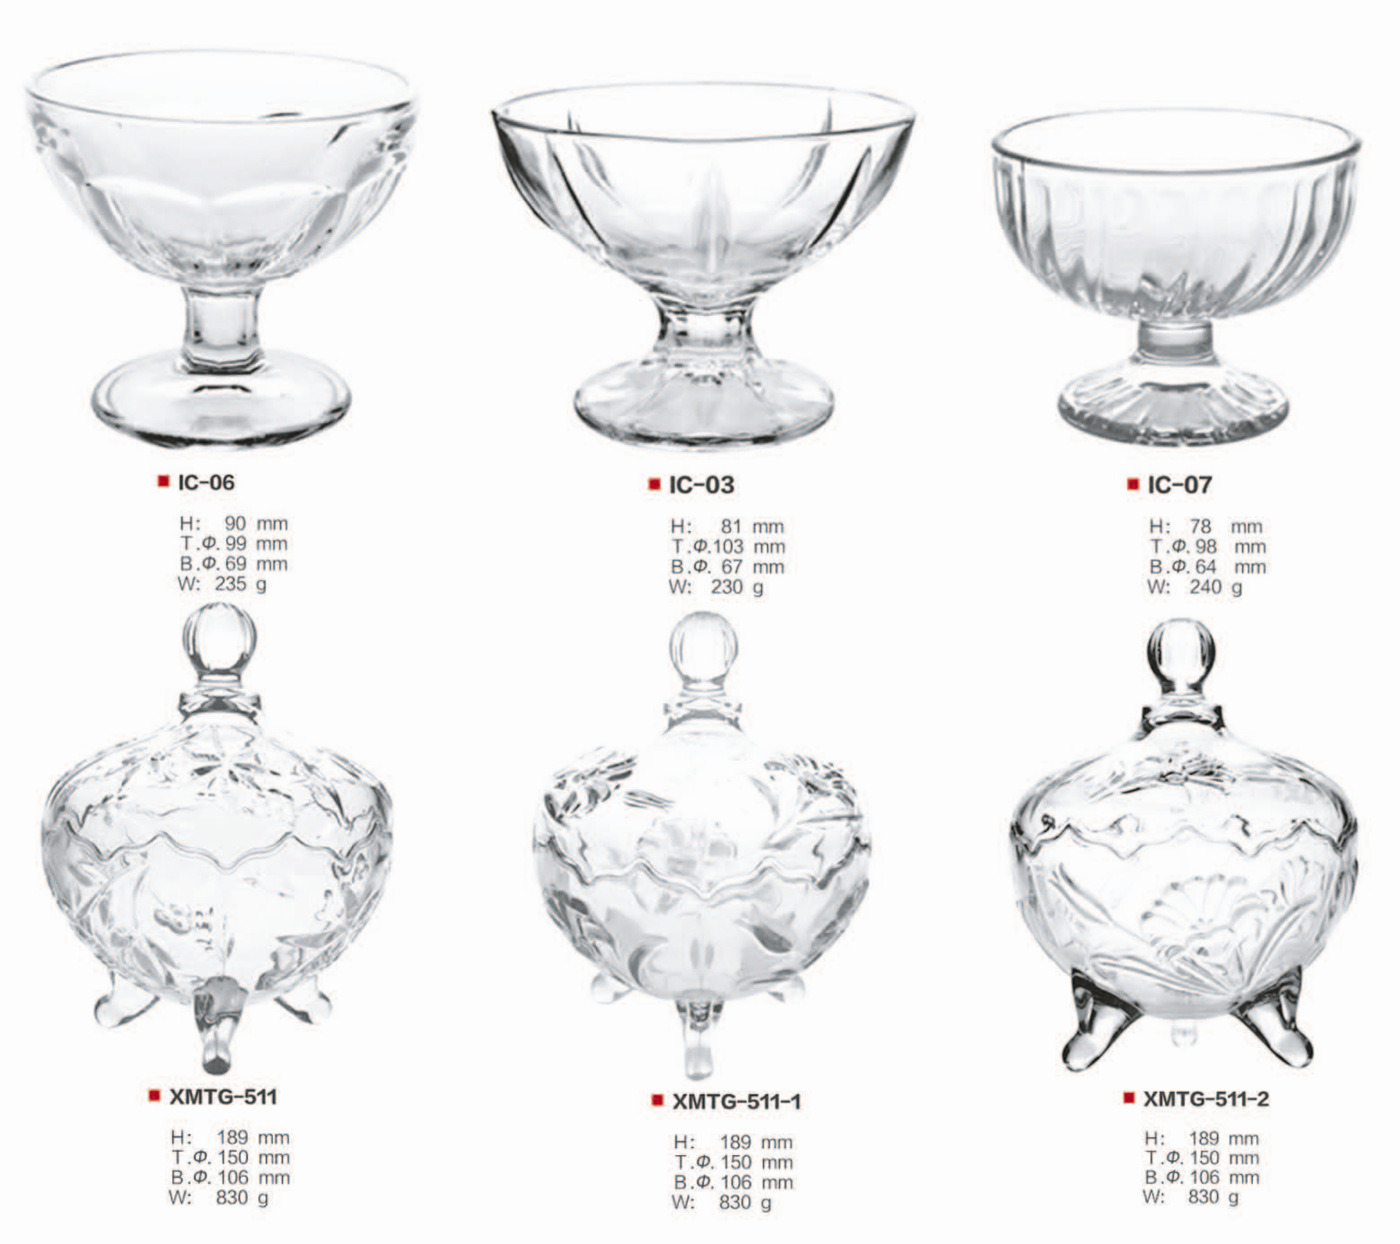 Glassware / Mug / Tumbler / Beer Glass / Drinking Glass